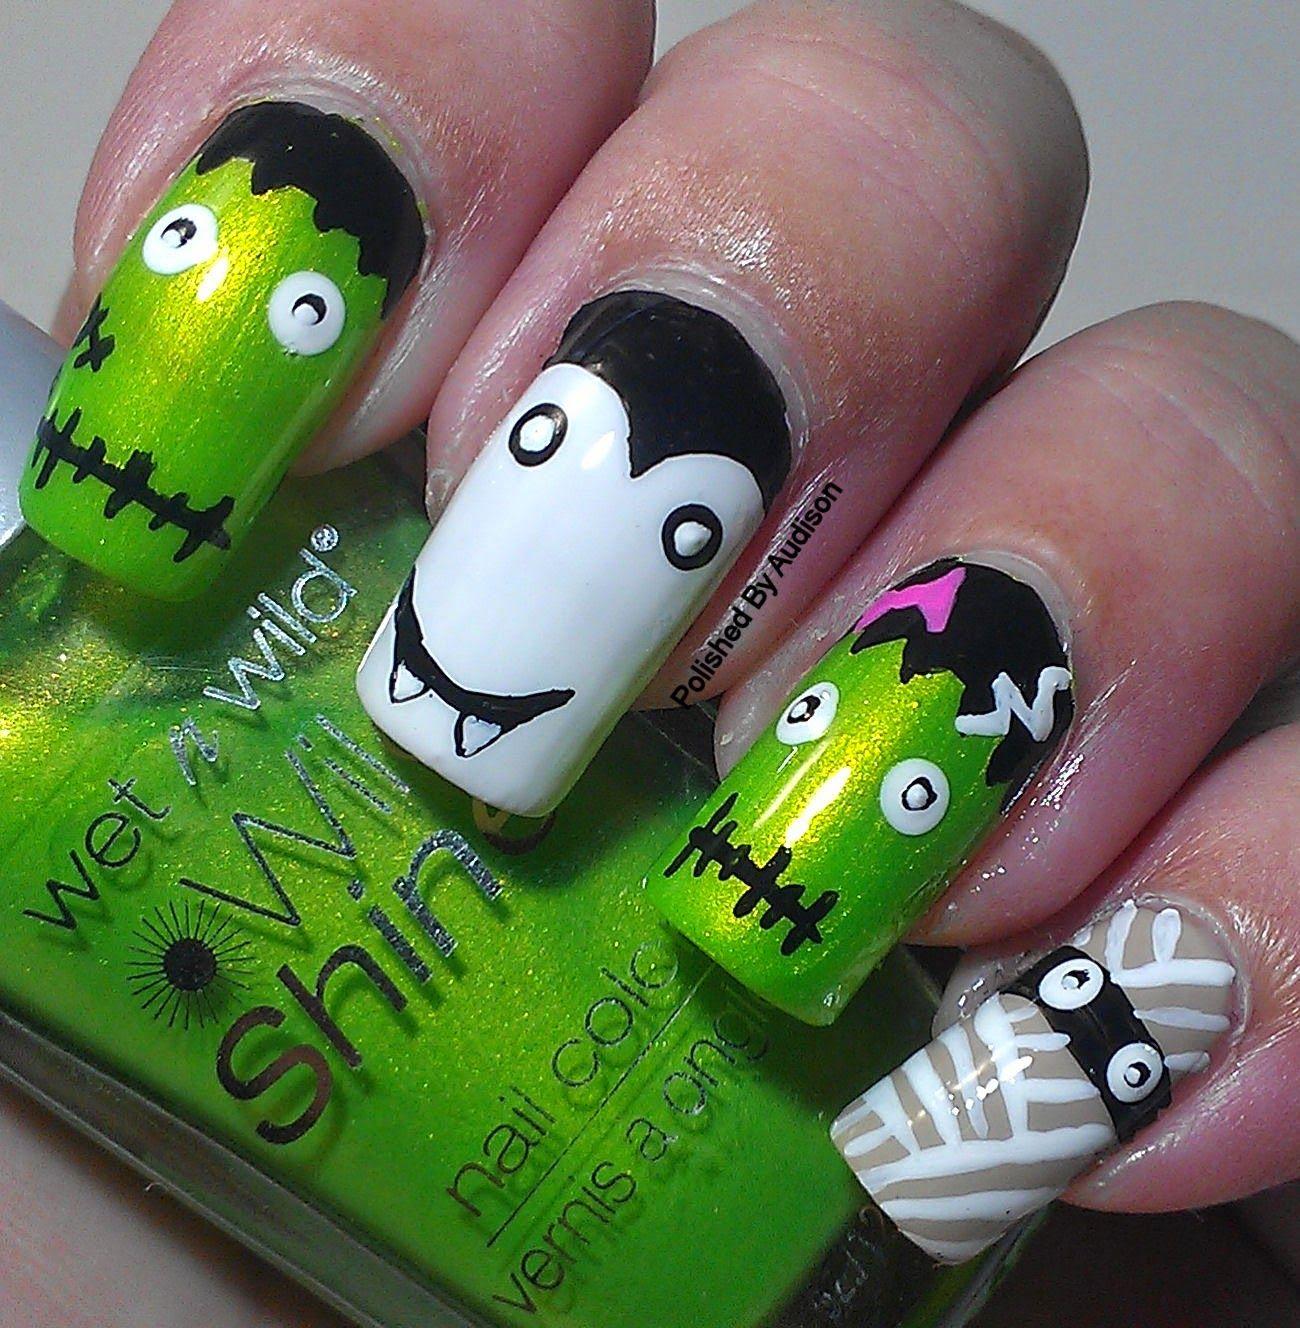 13 days of Halloween | Gel nail designs, Halloween monster ...